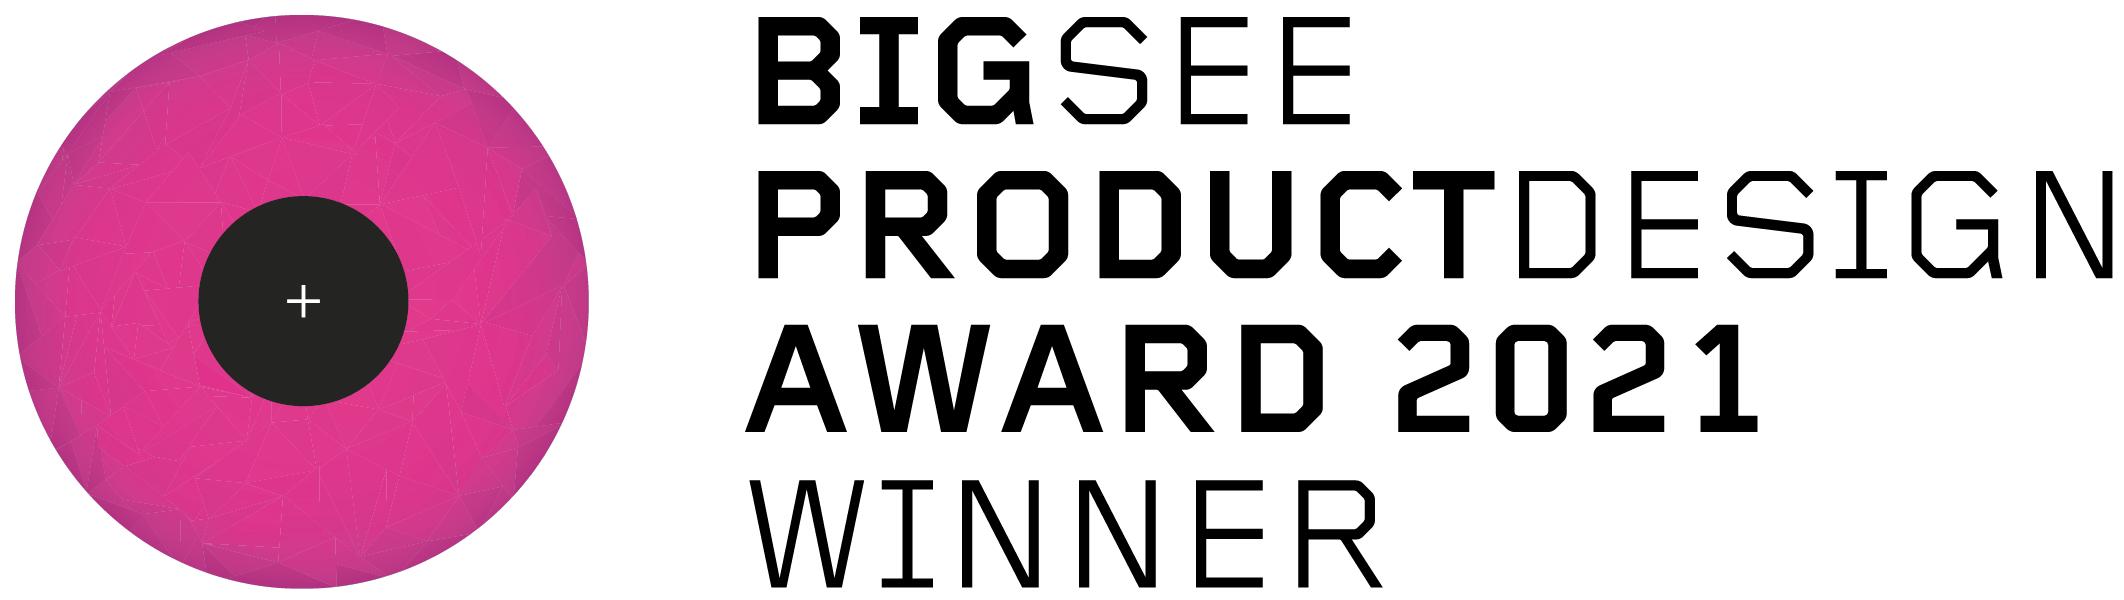 BigSee ProductDesign Award 2021 Winner